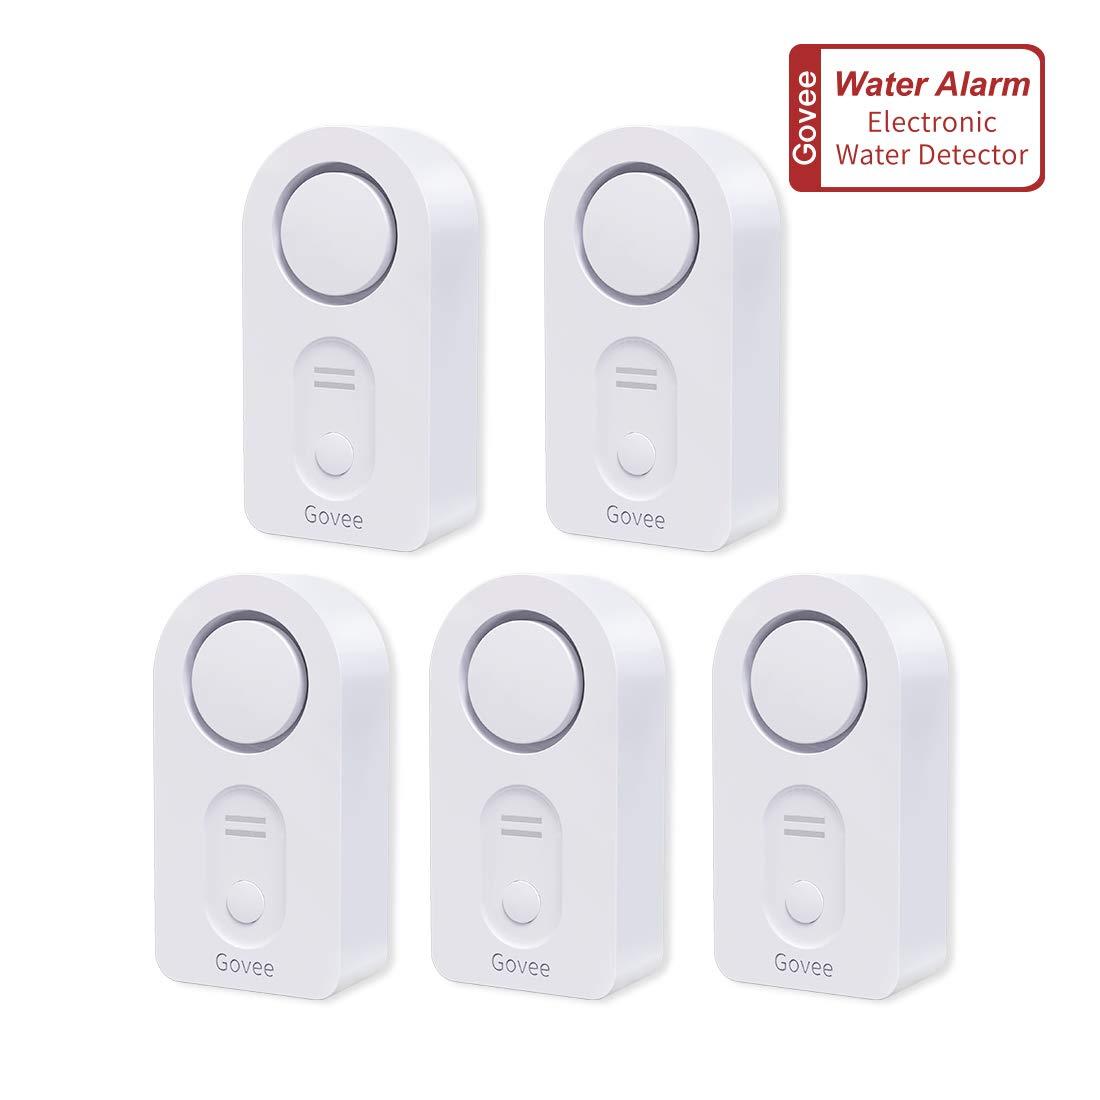 Govee Water Detectors, Wireless Water Leak Detector with 100 DB Loud Alarm, Water Sensor with Sensitive Leak Probes, Water Sensor Alarm for Kitchen Bathroom Basement Floor(Battery Included)-5 Pack